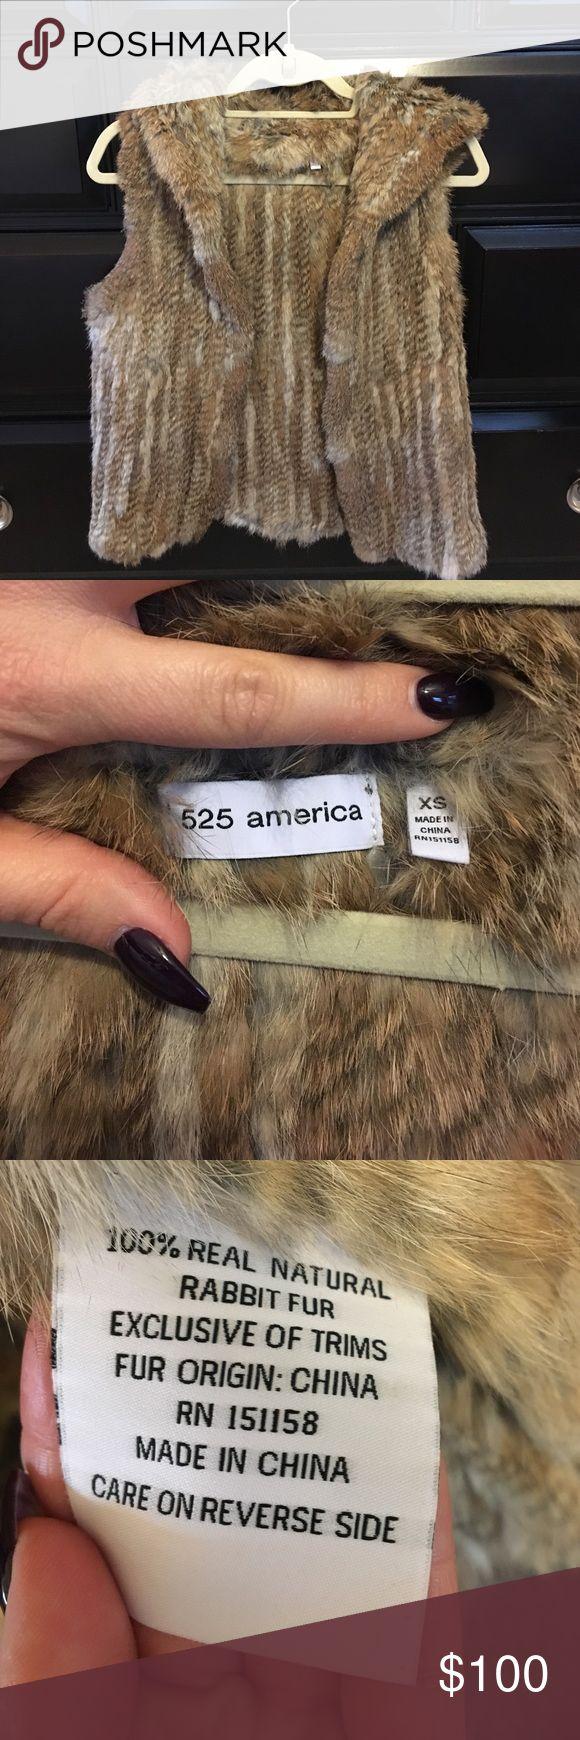 BRAND NEW 💕 Real rabbit fur vest Never worn real fur vest with hood 525 america Jackets & Coats Vests